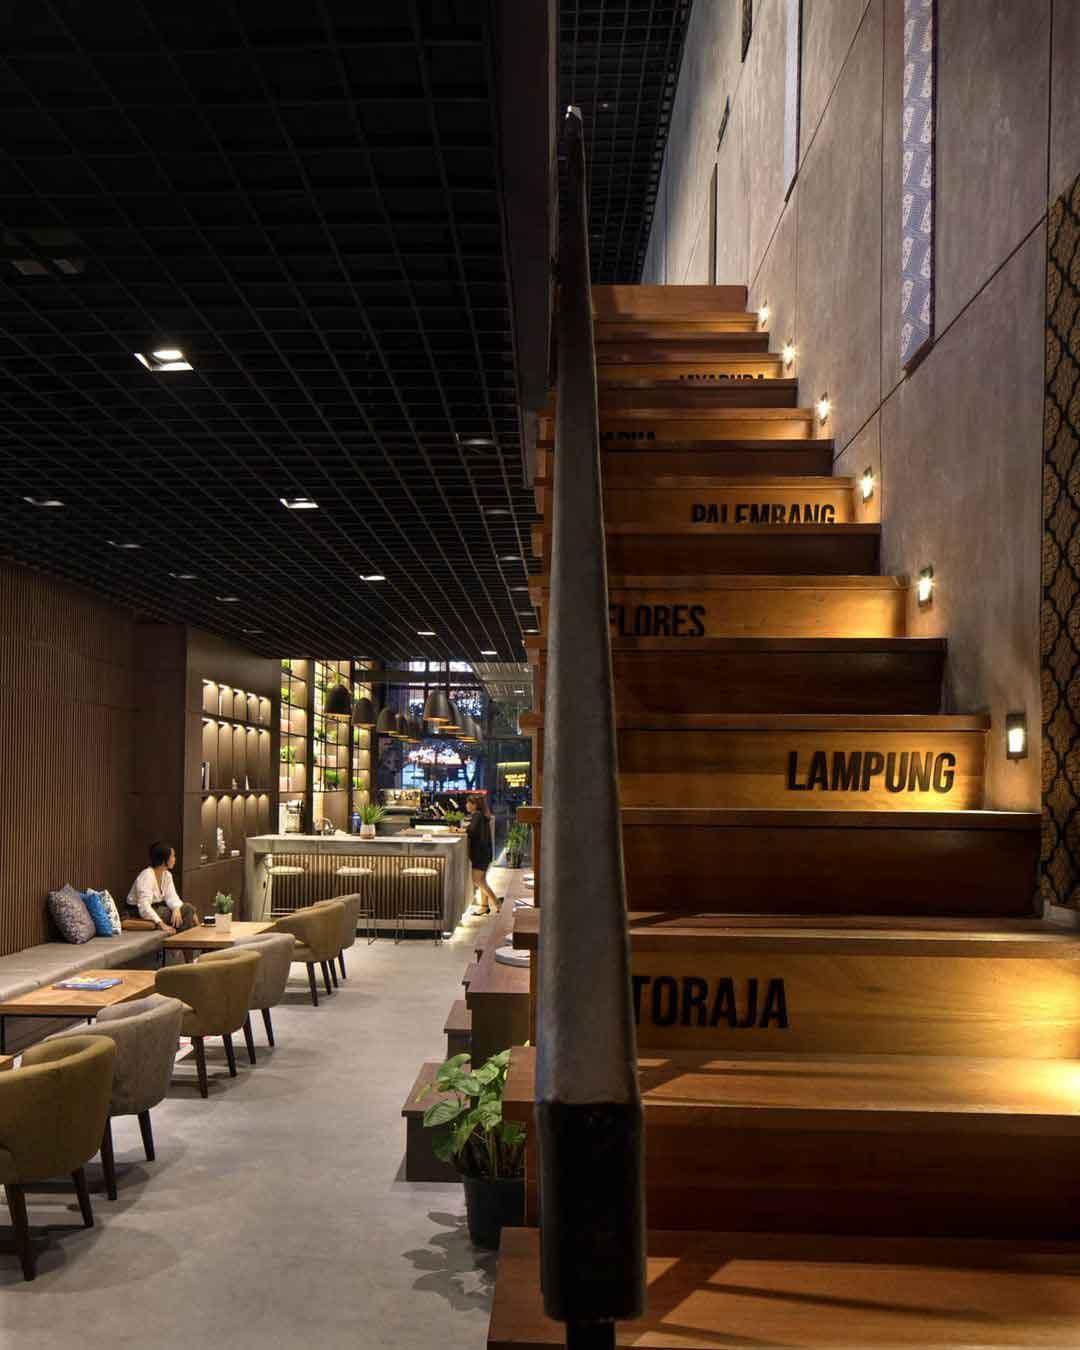 Desain Interior Kopi Se Indonesia Outlet PIK Image From @utpala.photoworks